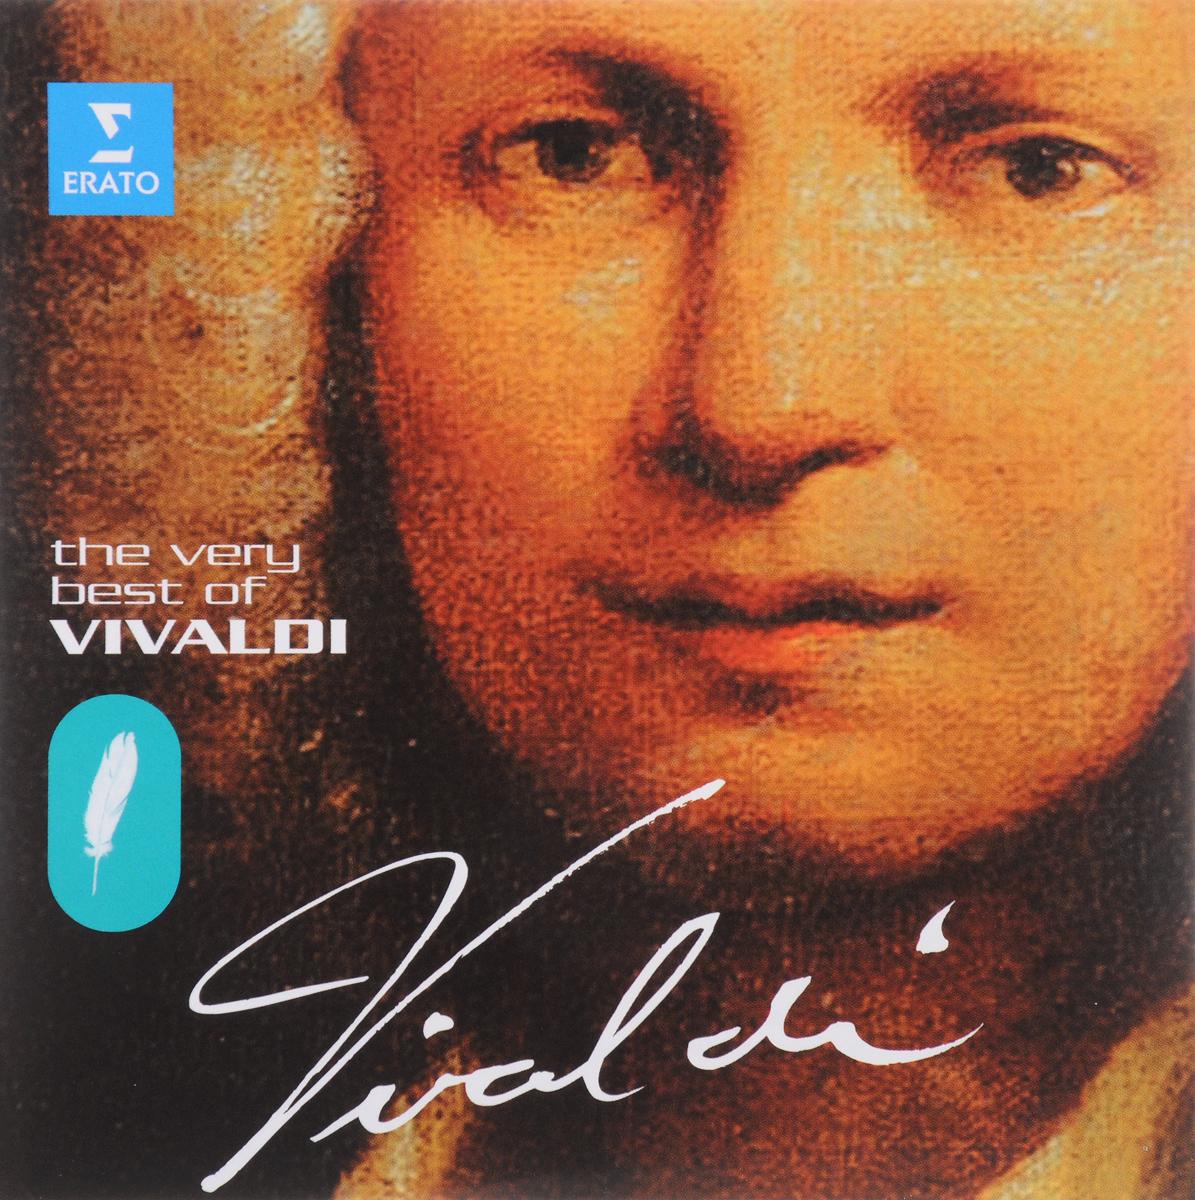 VARIOUS ARTISTS. THE VERY BEST OF VIVALDI виниловая пластинка various artists john morales presents the m